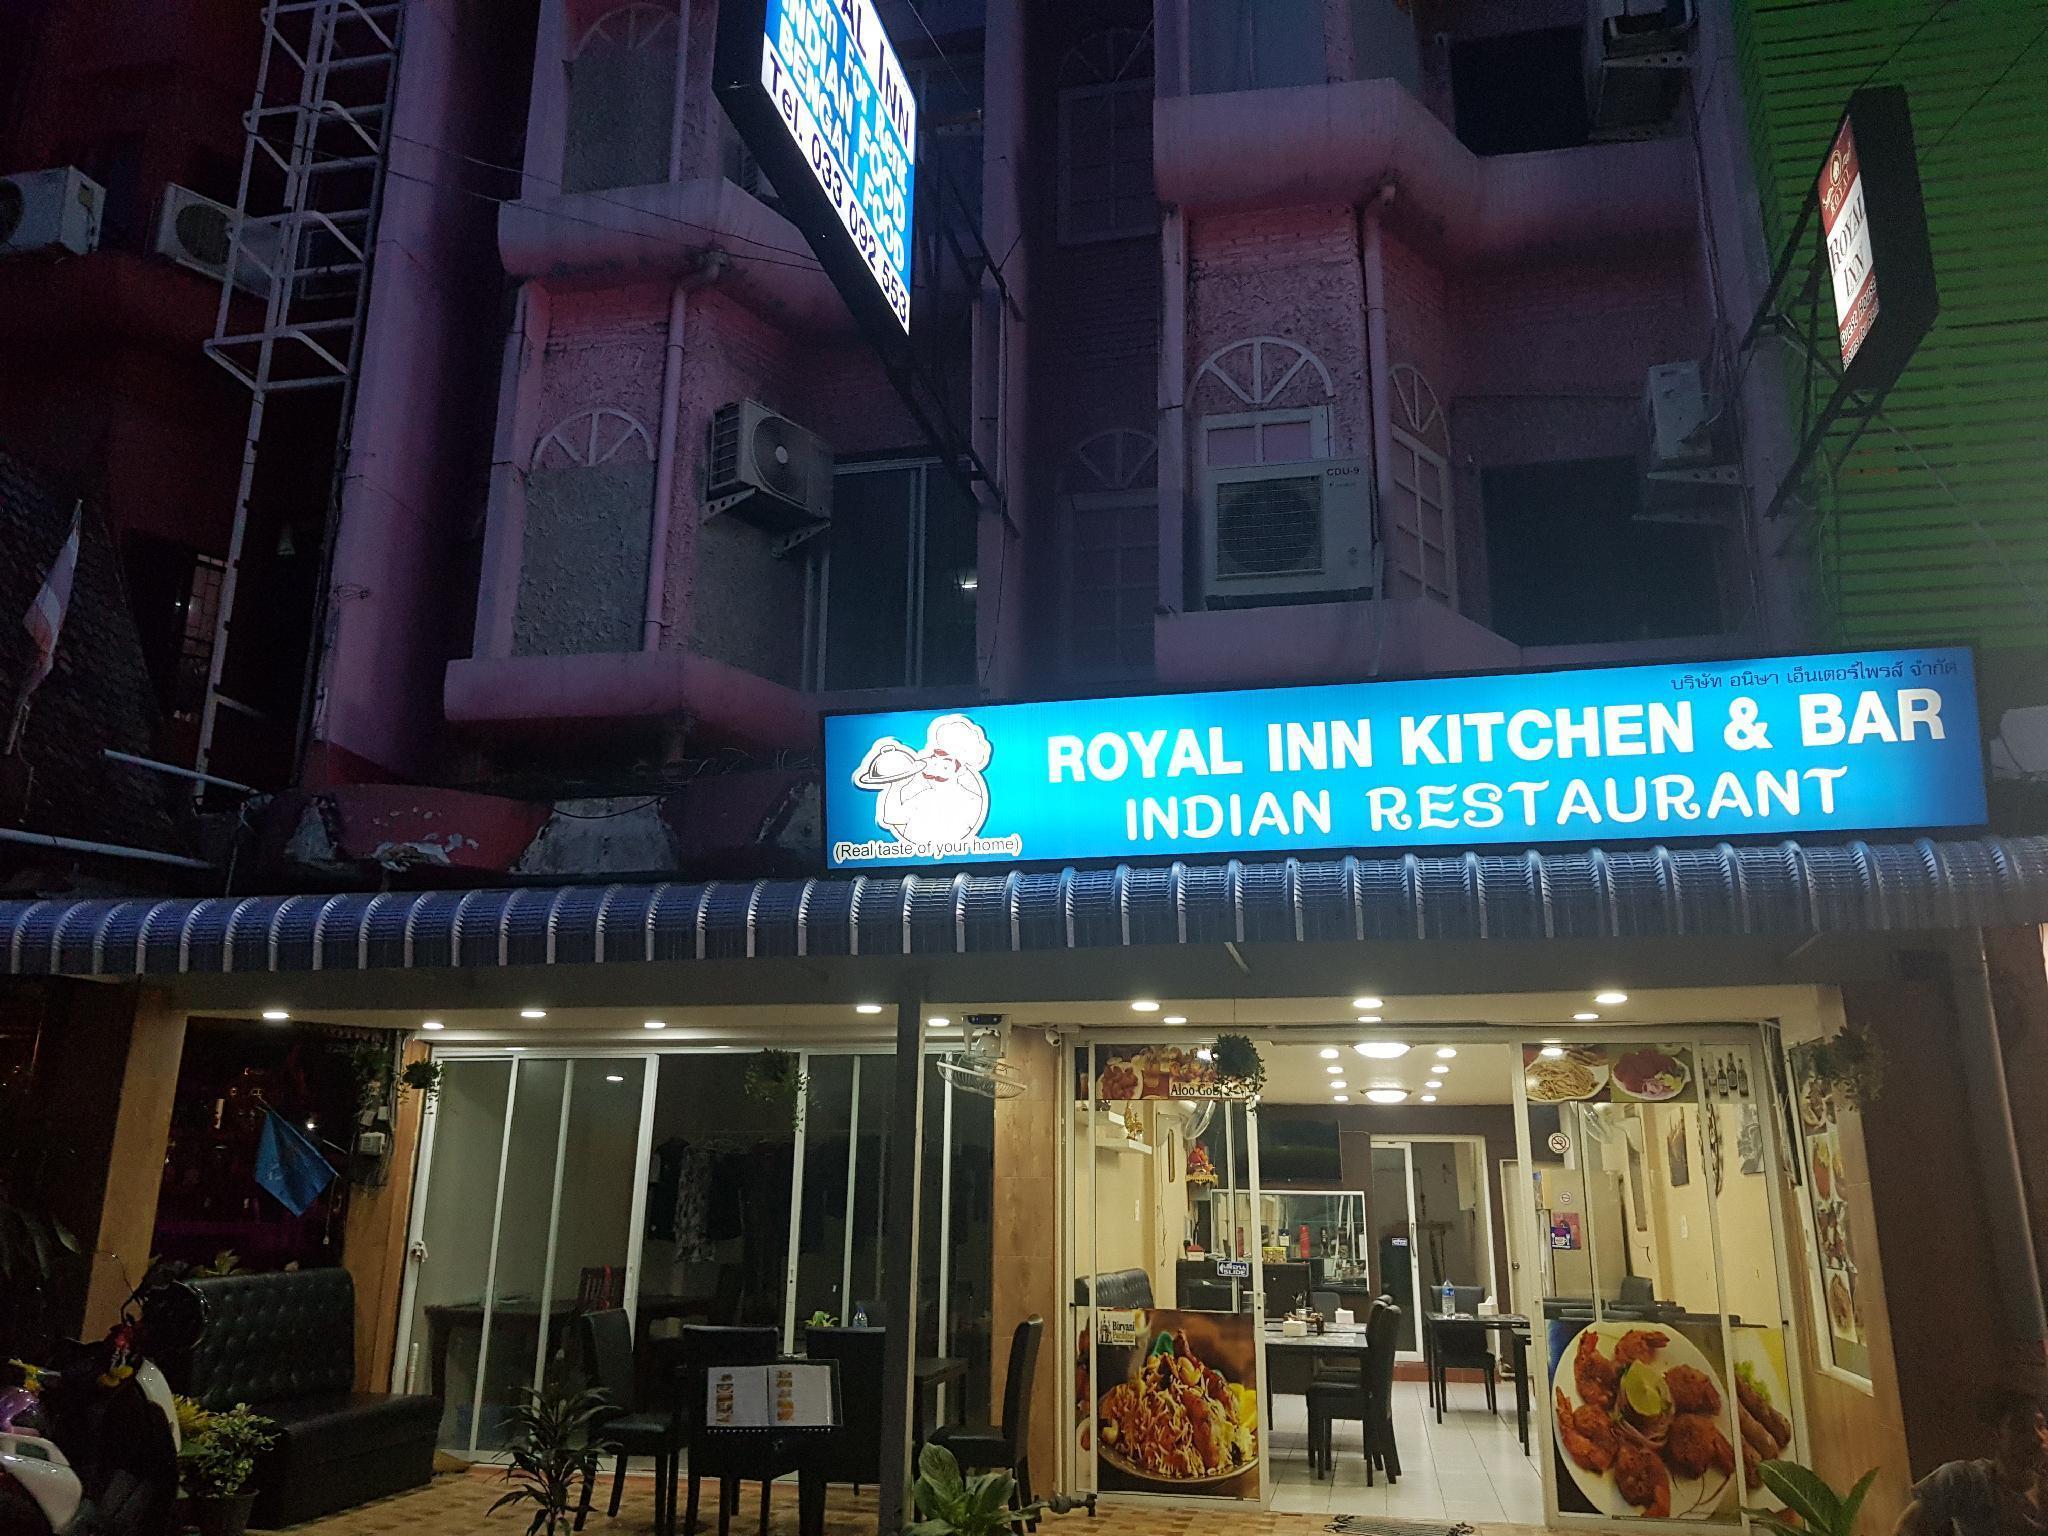 Royal Inn Kitchen & Bar Royal Inn Kitchen & Bar